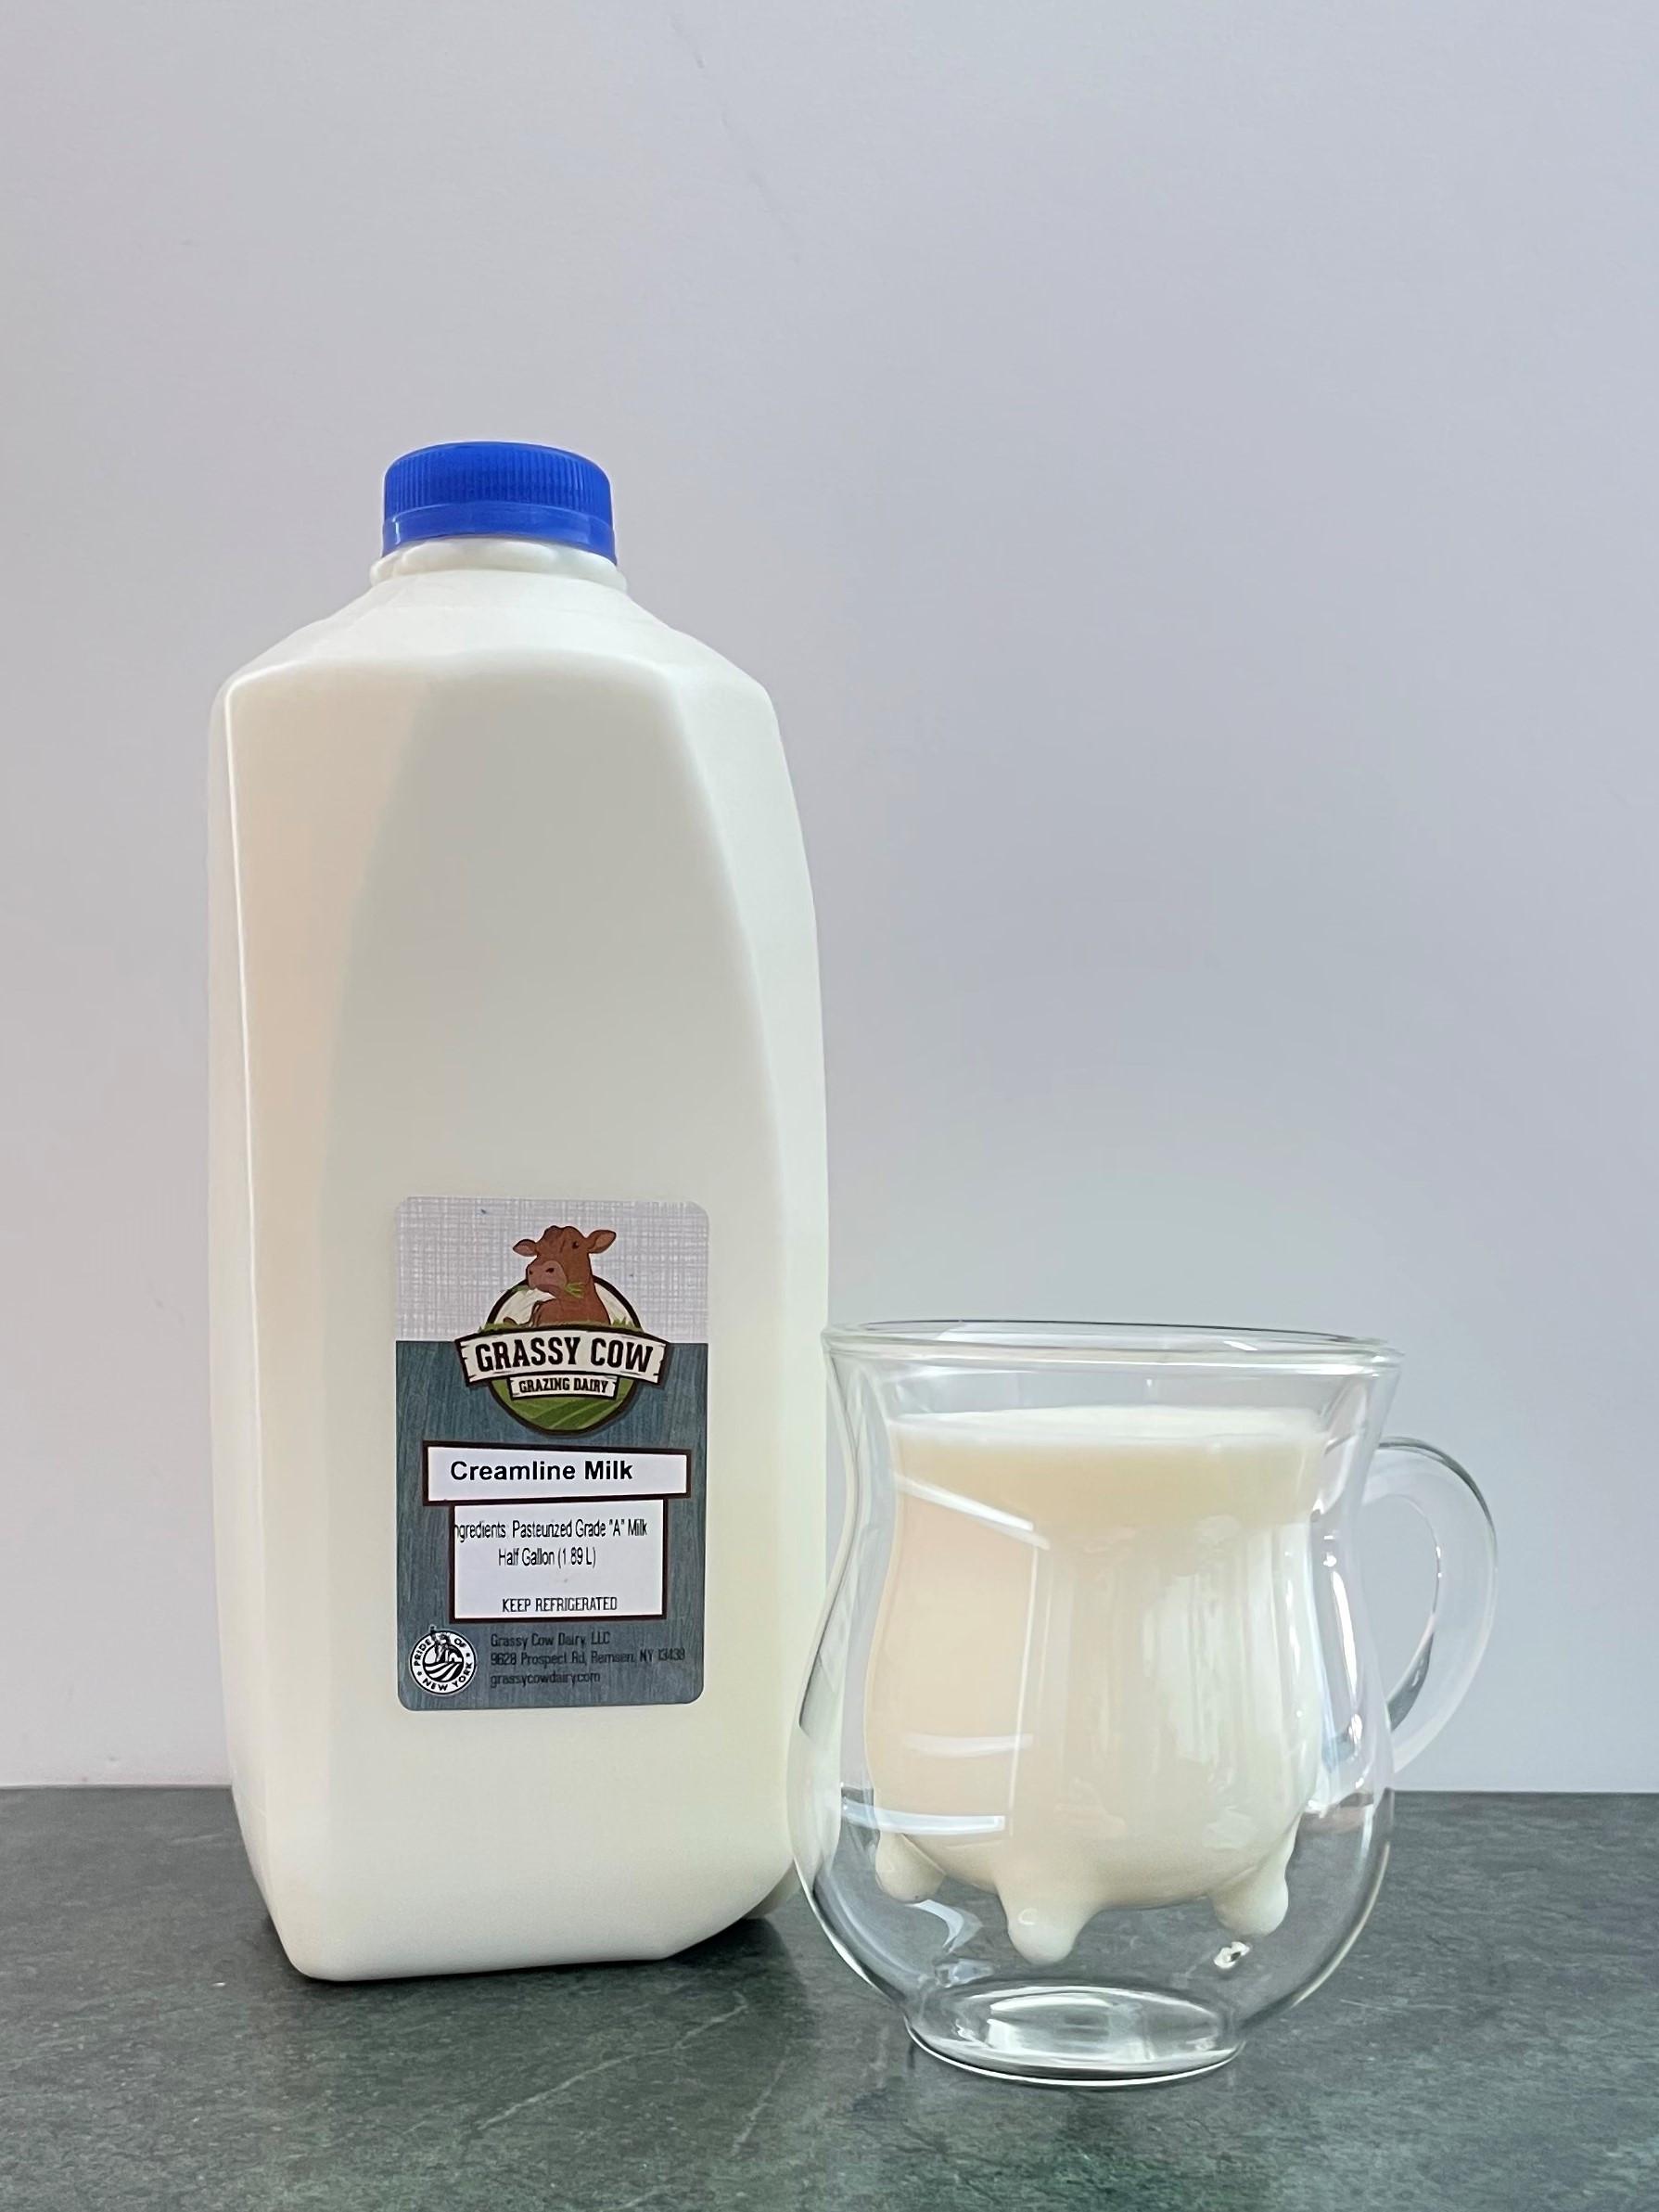 Creamline Milk - Half Gallon